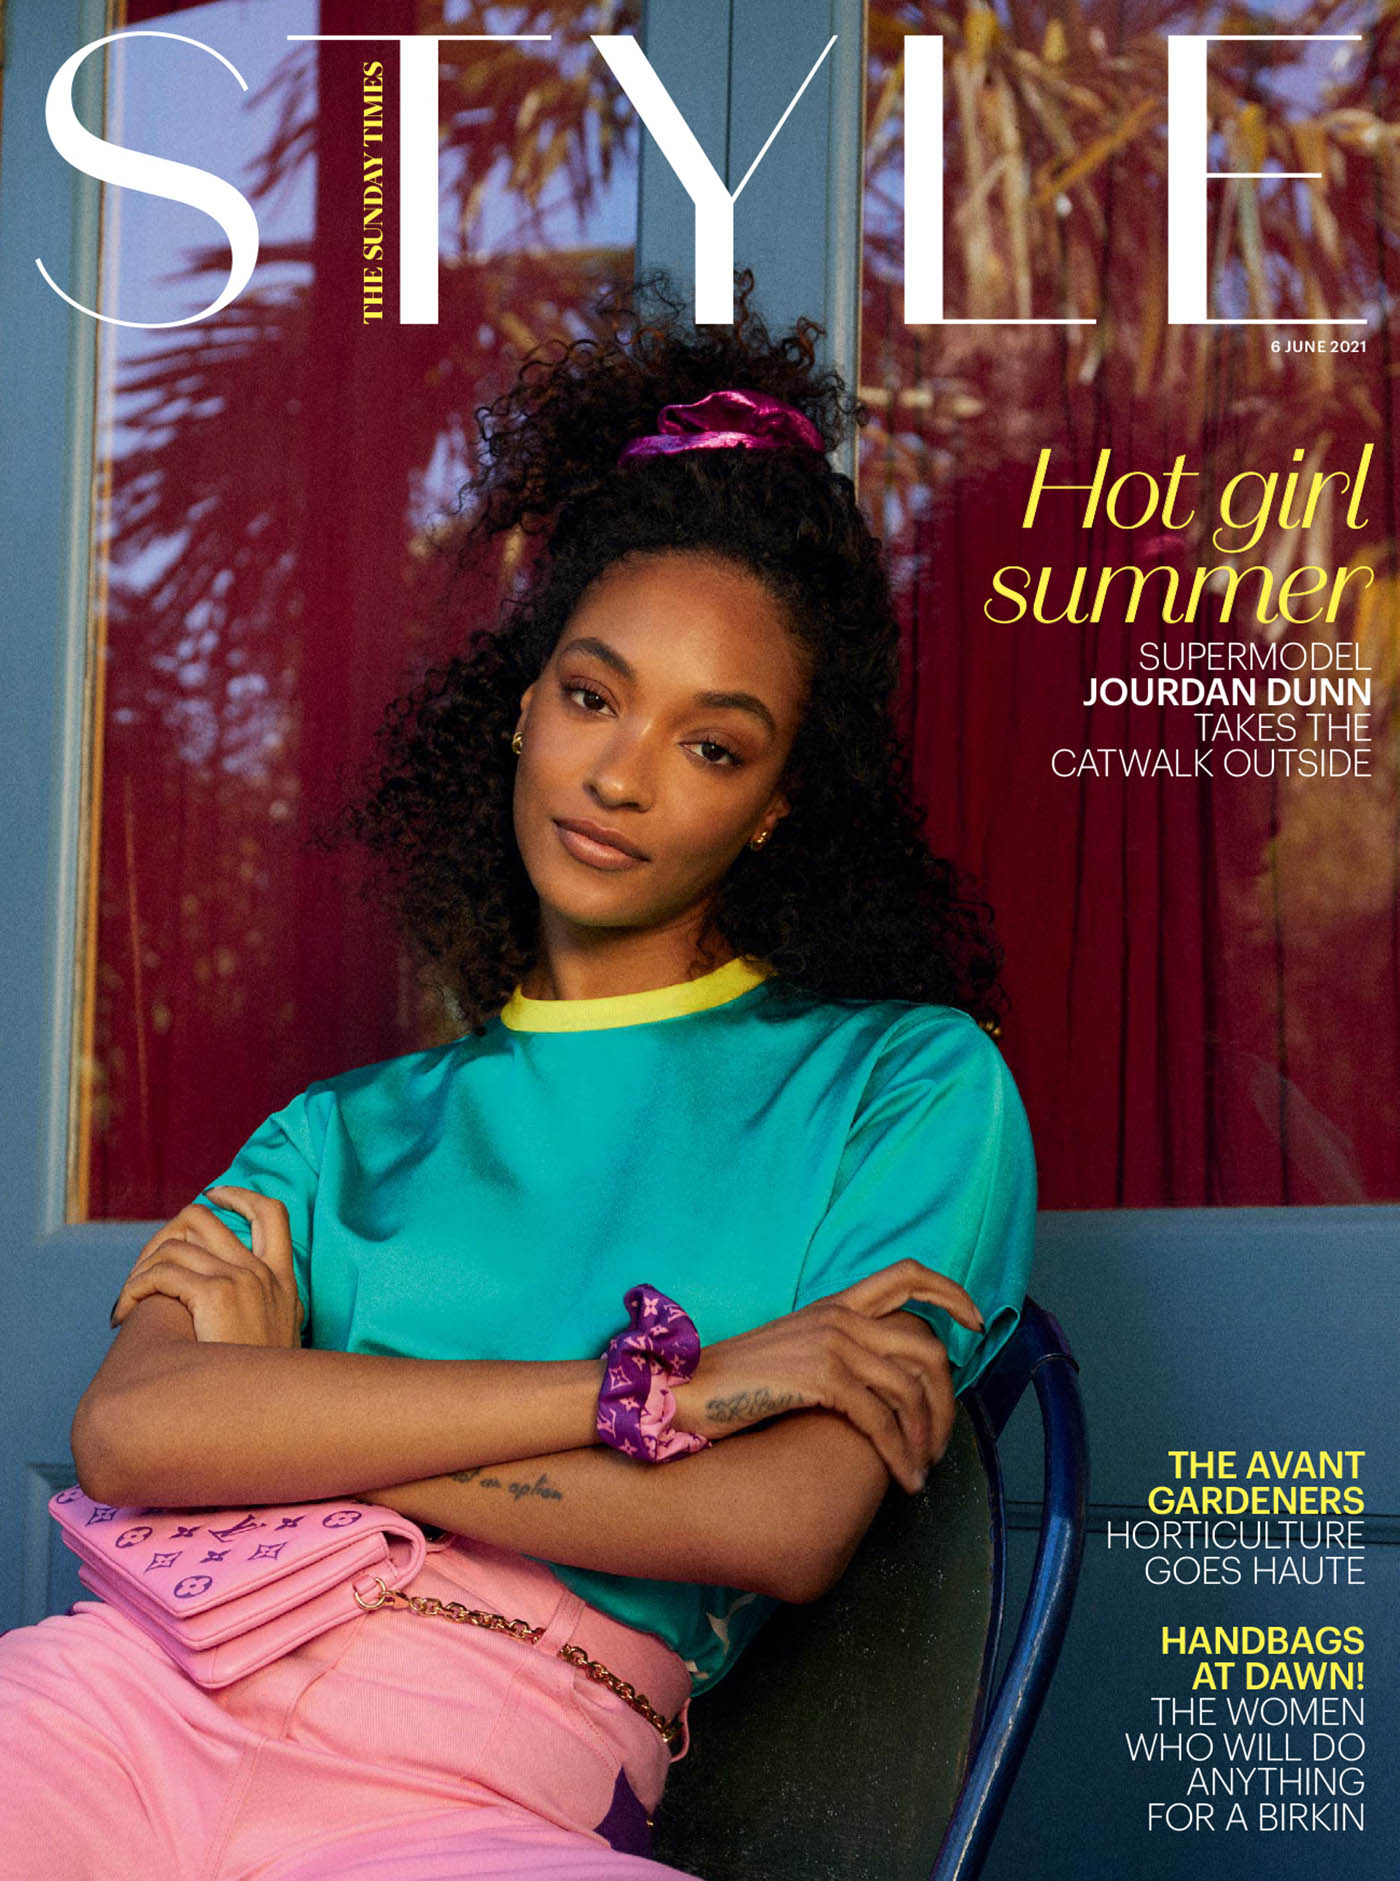 Jourdan Dunn covers The Sunday Times Style June 6th, 2021 by Olivia Lifungula